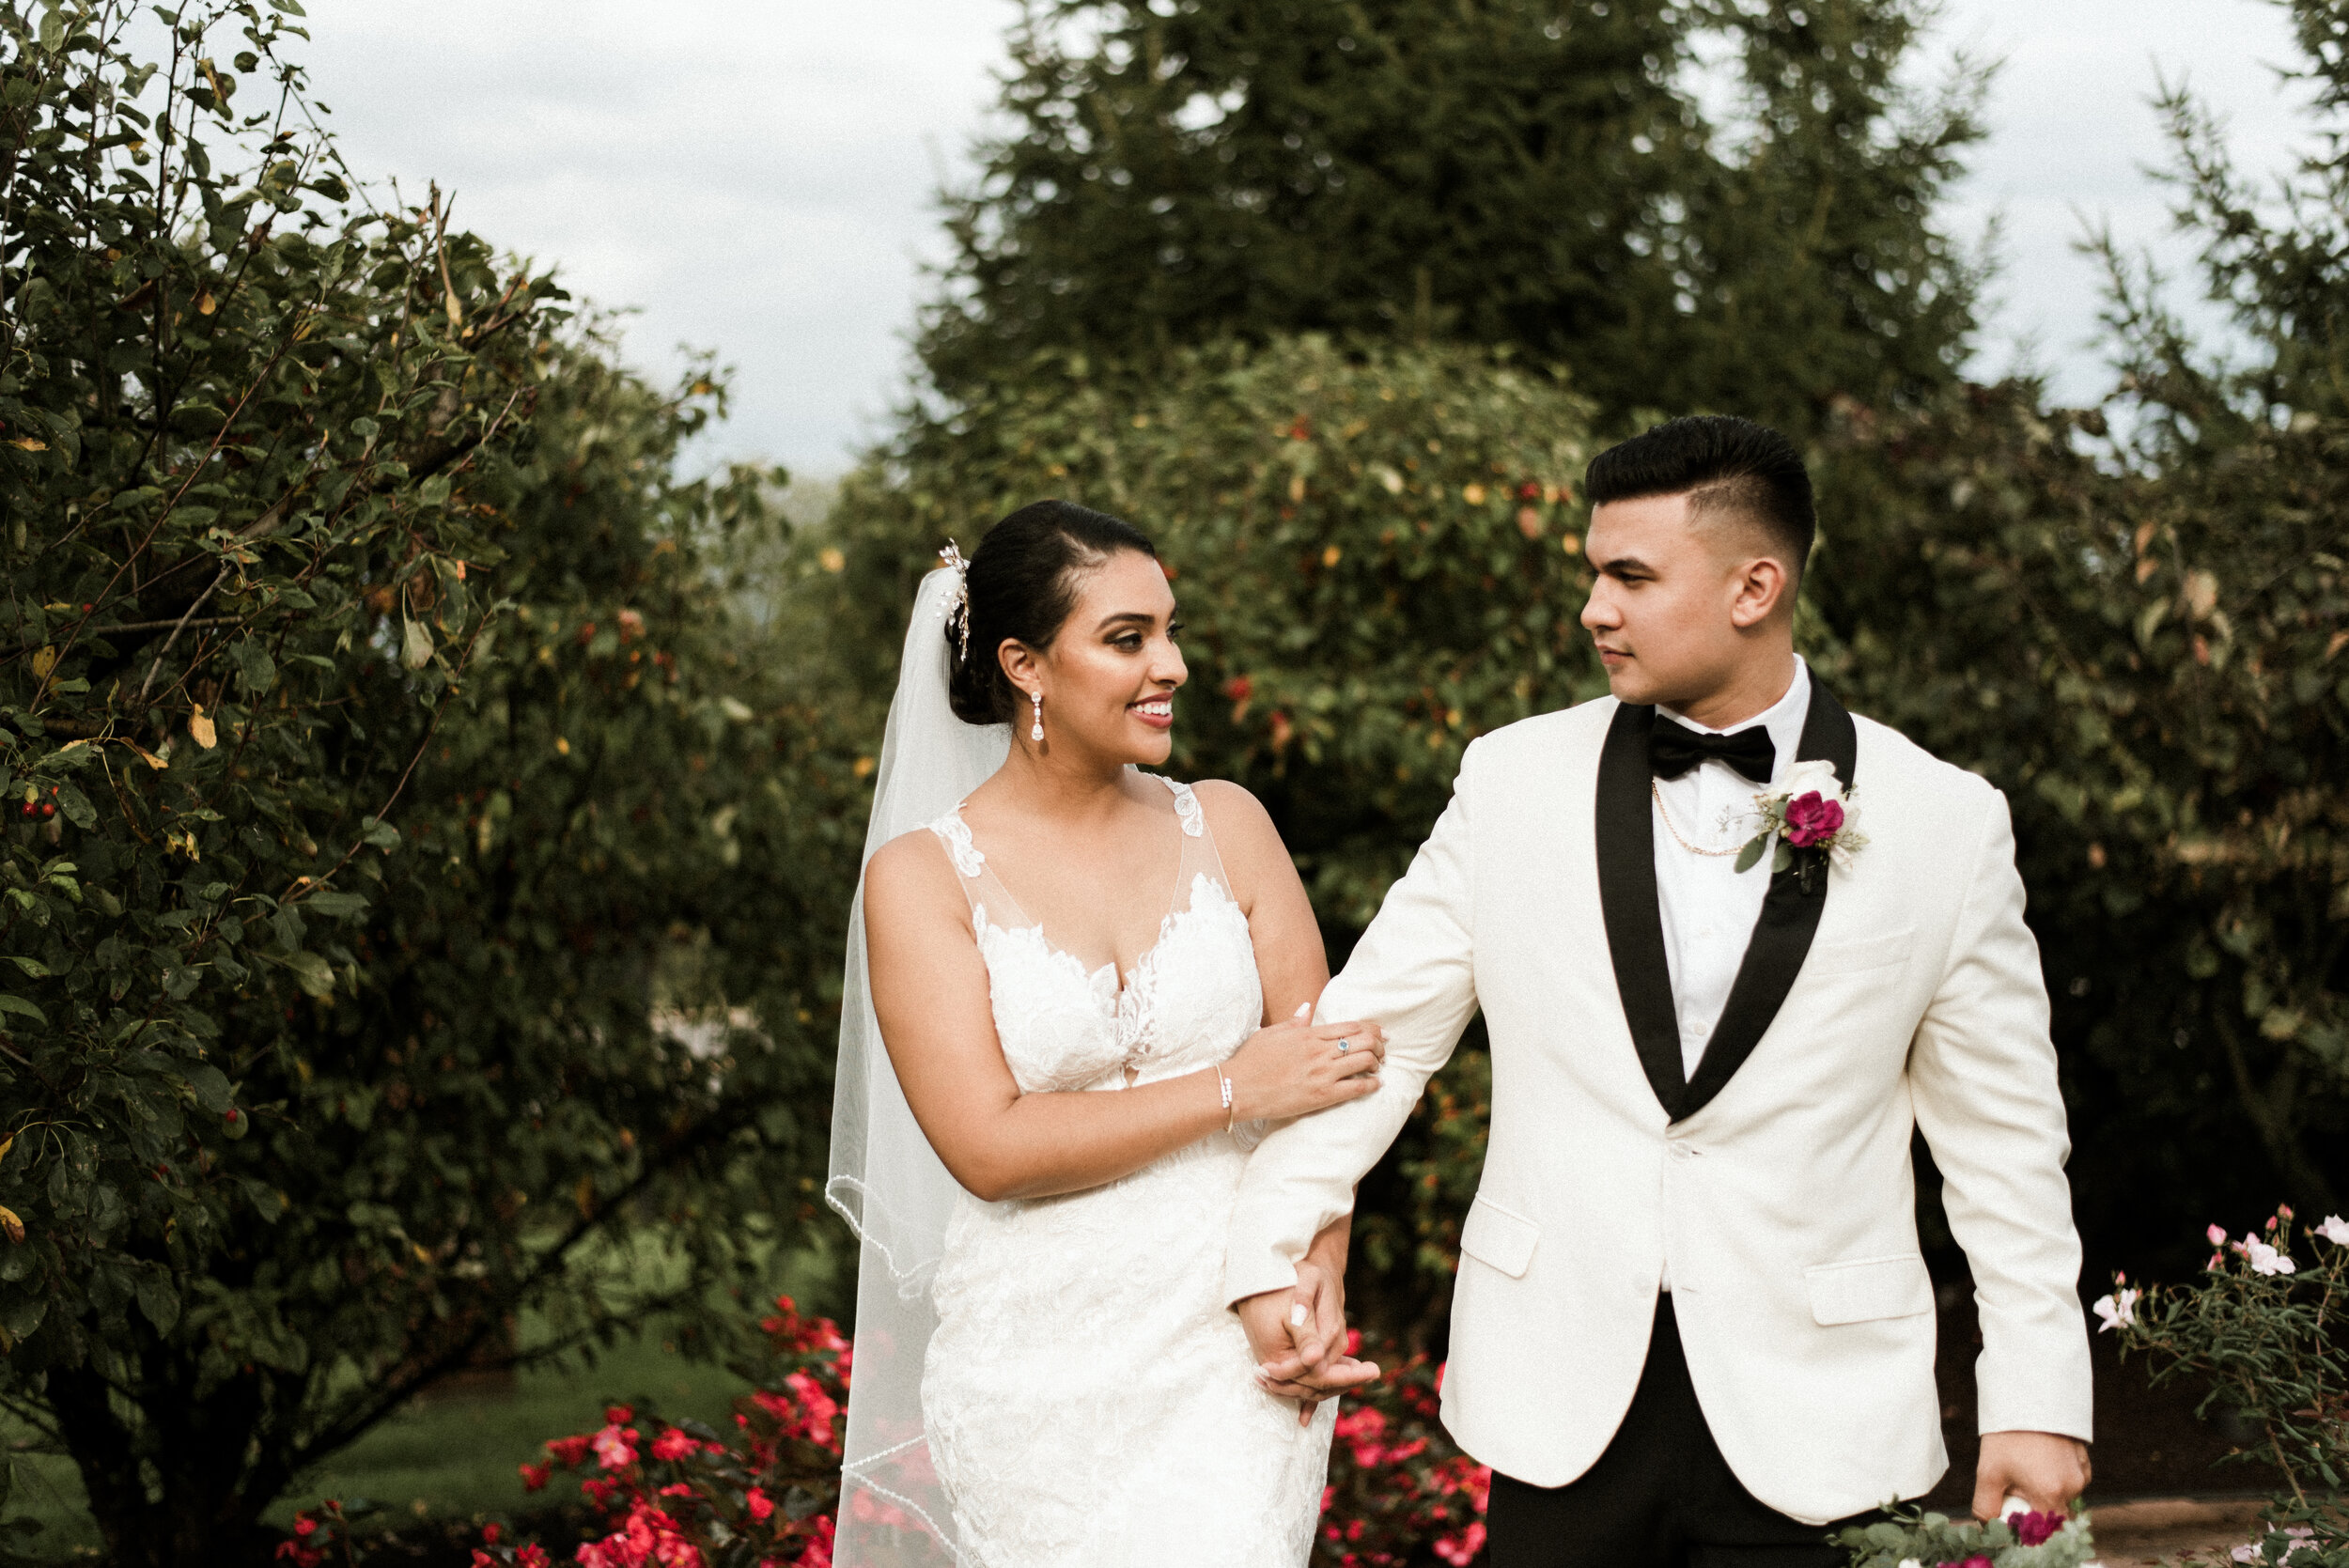 Elizabeth And Arik - | Rainy & Romantic Chicago Wedding | St. Raphael The Archangel Catholic Church | Concorde Banquet Kildeer, IL | Naperville Wedding Photographer